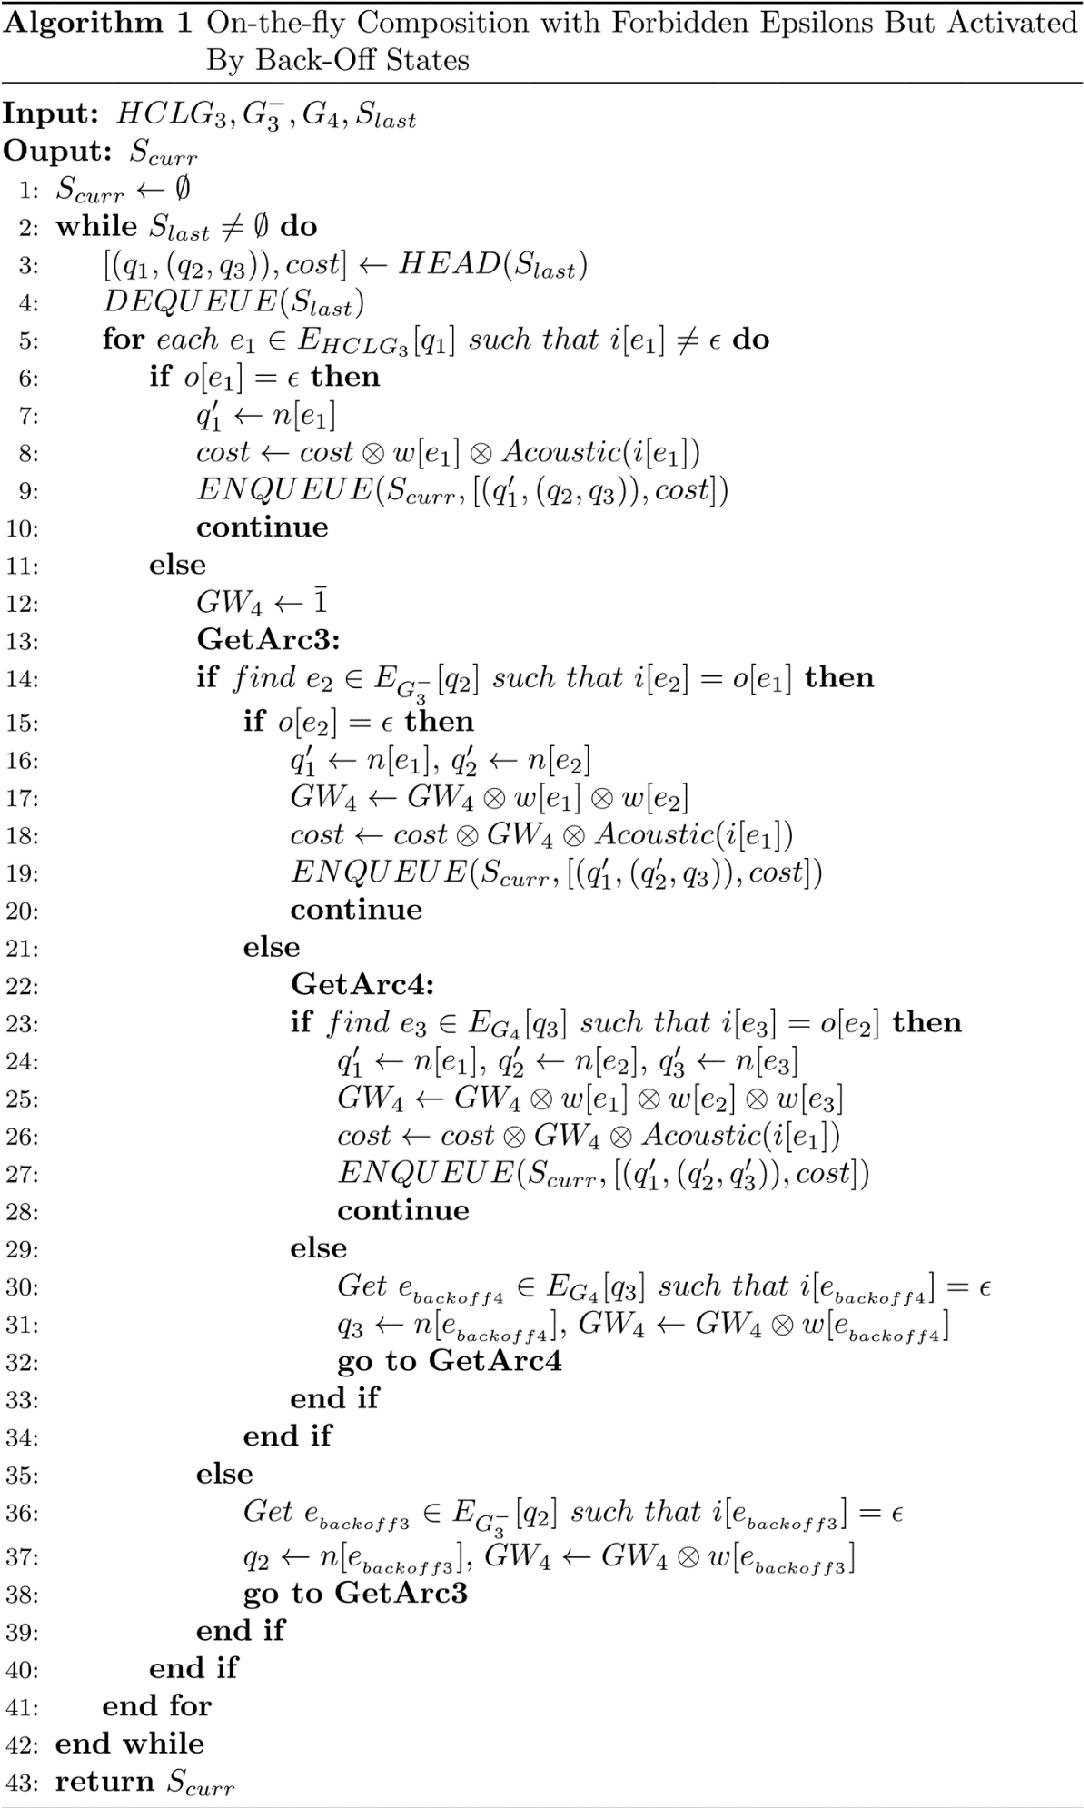 Figure 2 for Improving Uyghur ASR systems with decoders using morpheme-based language models